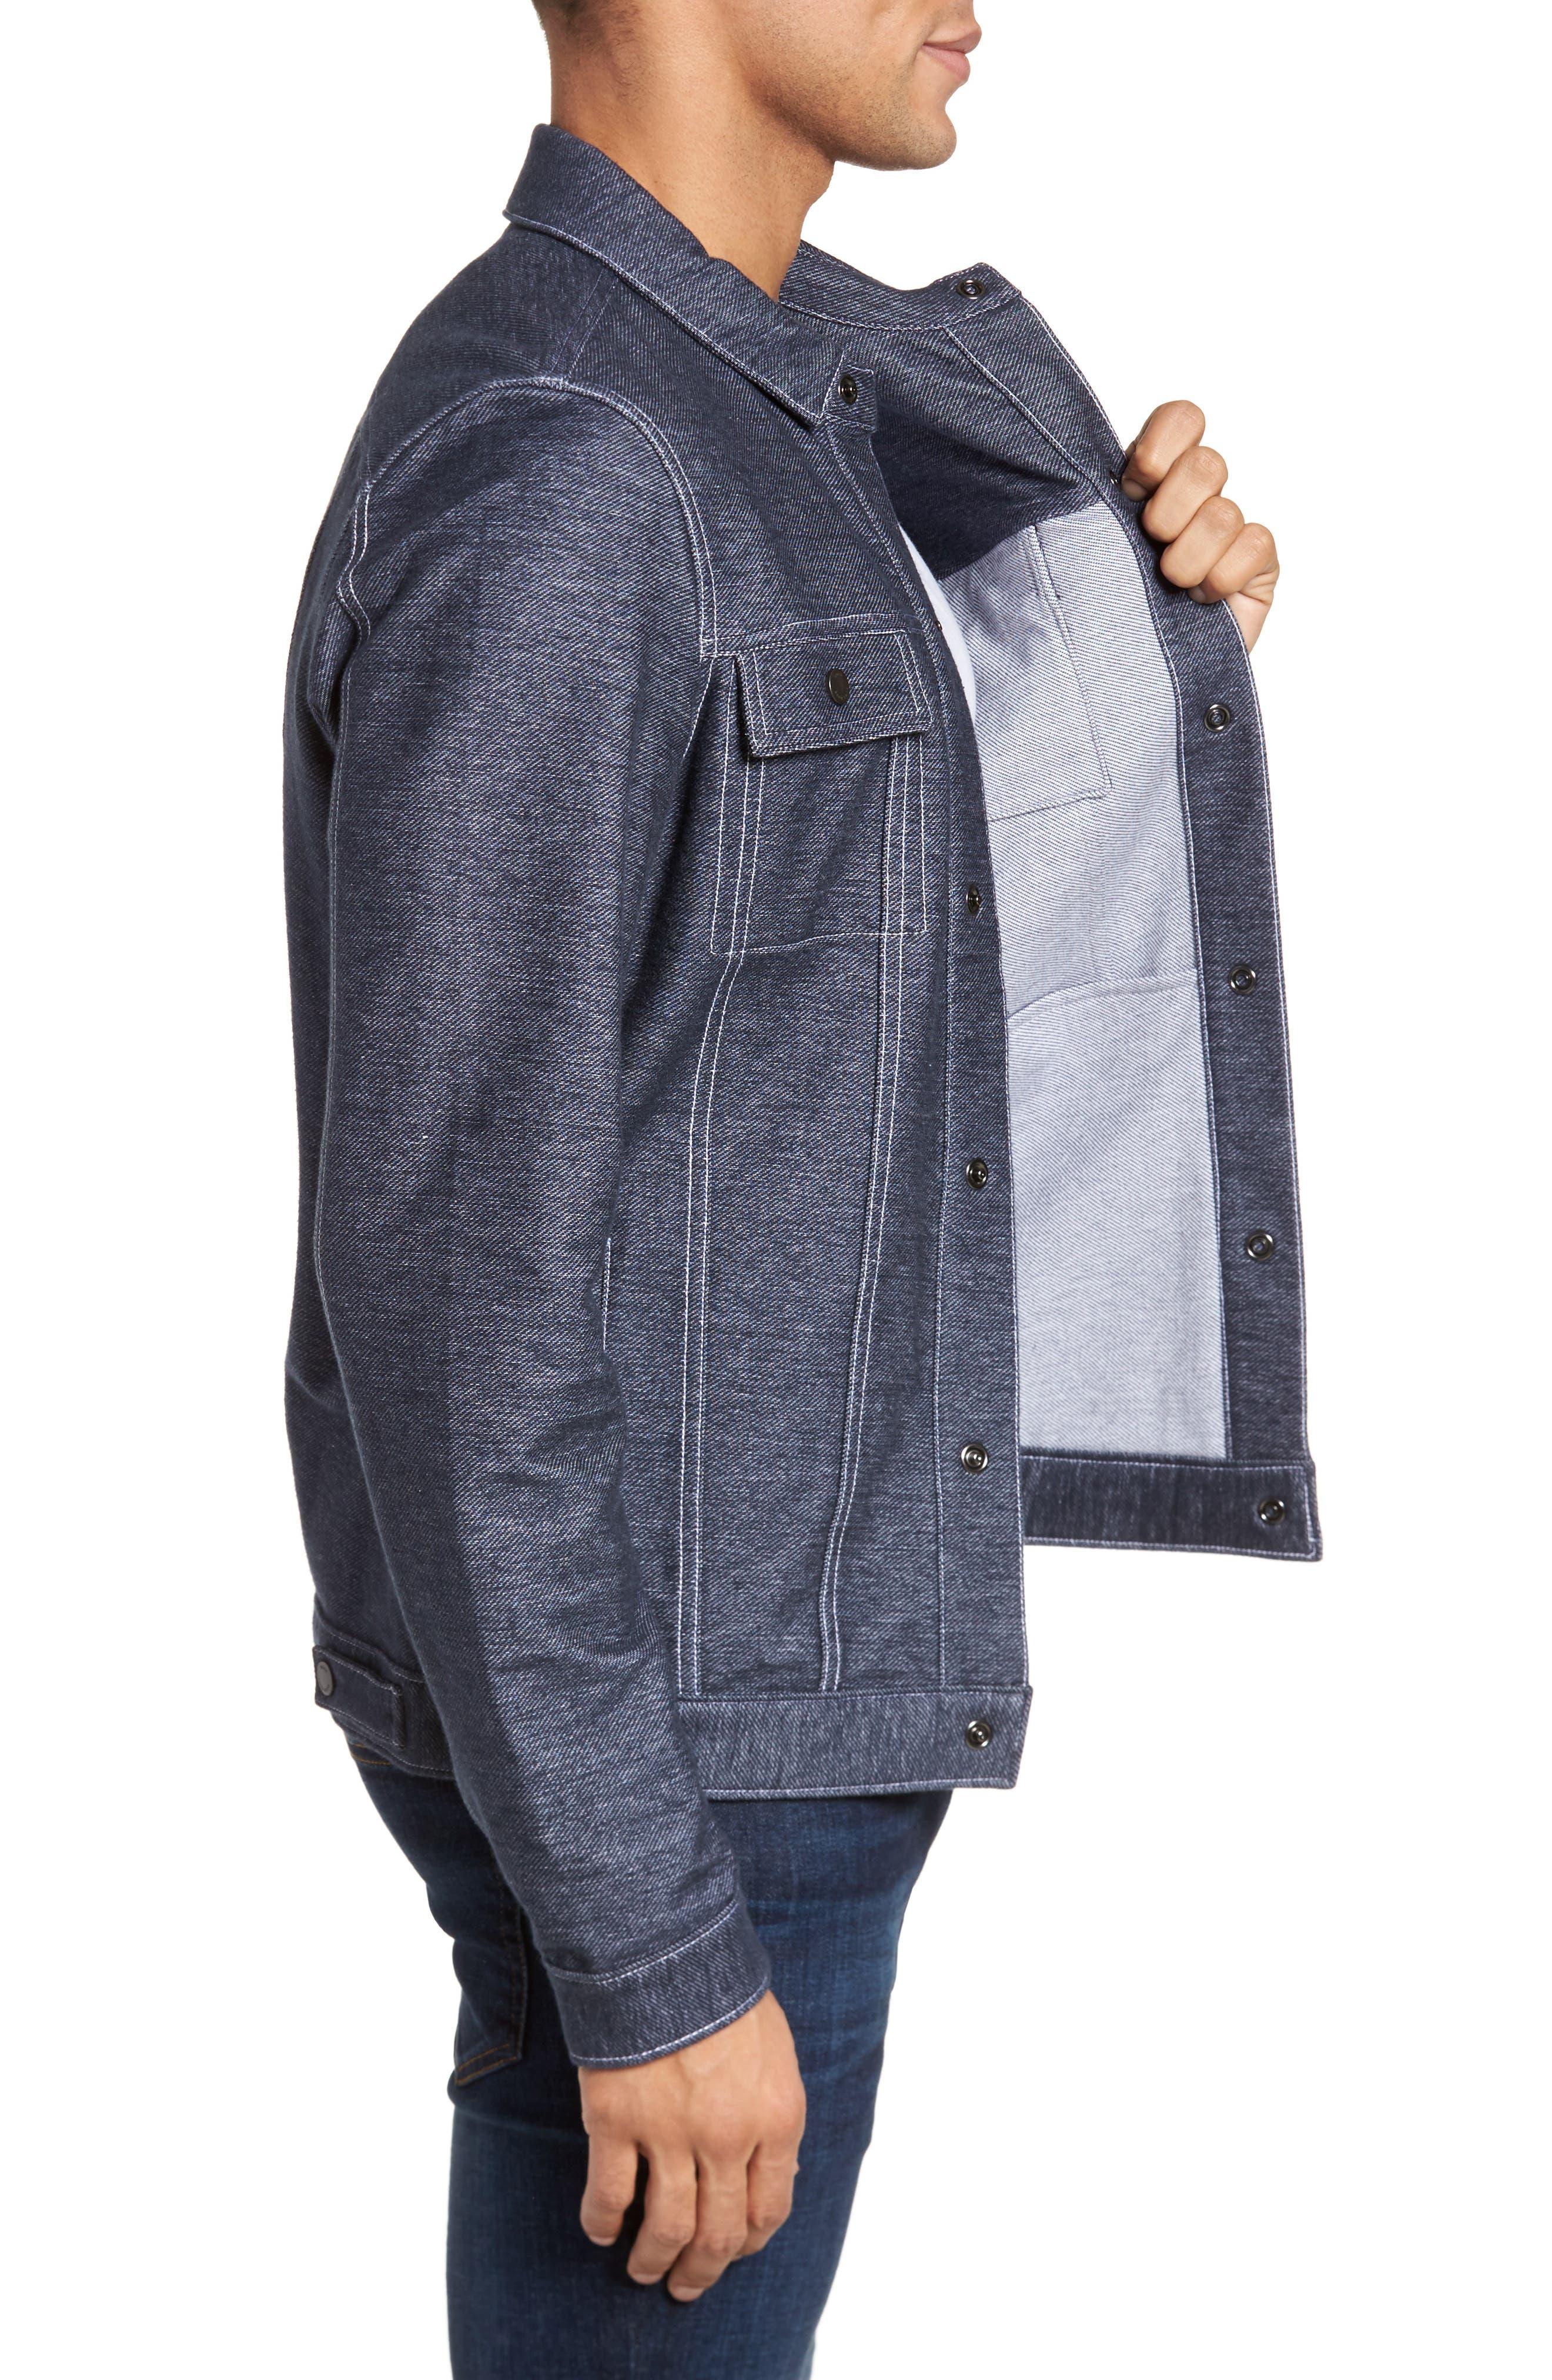 Sigmon Stretch Denim Jacket,                             Alternate thumbnail 3, color,                             Blue